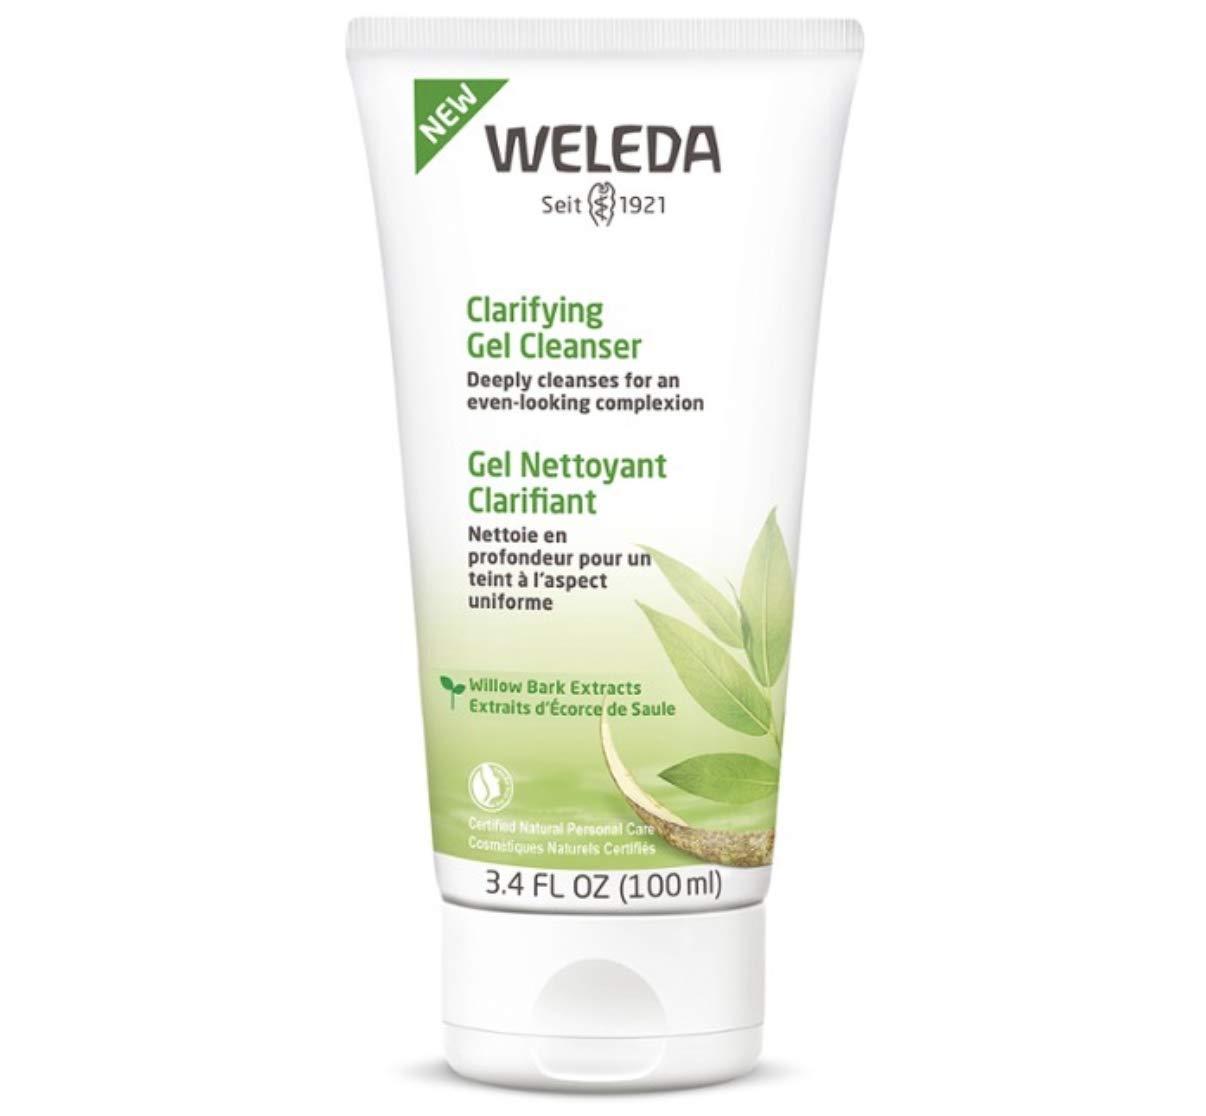 Weleda clarifying cleanser